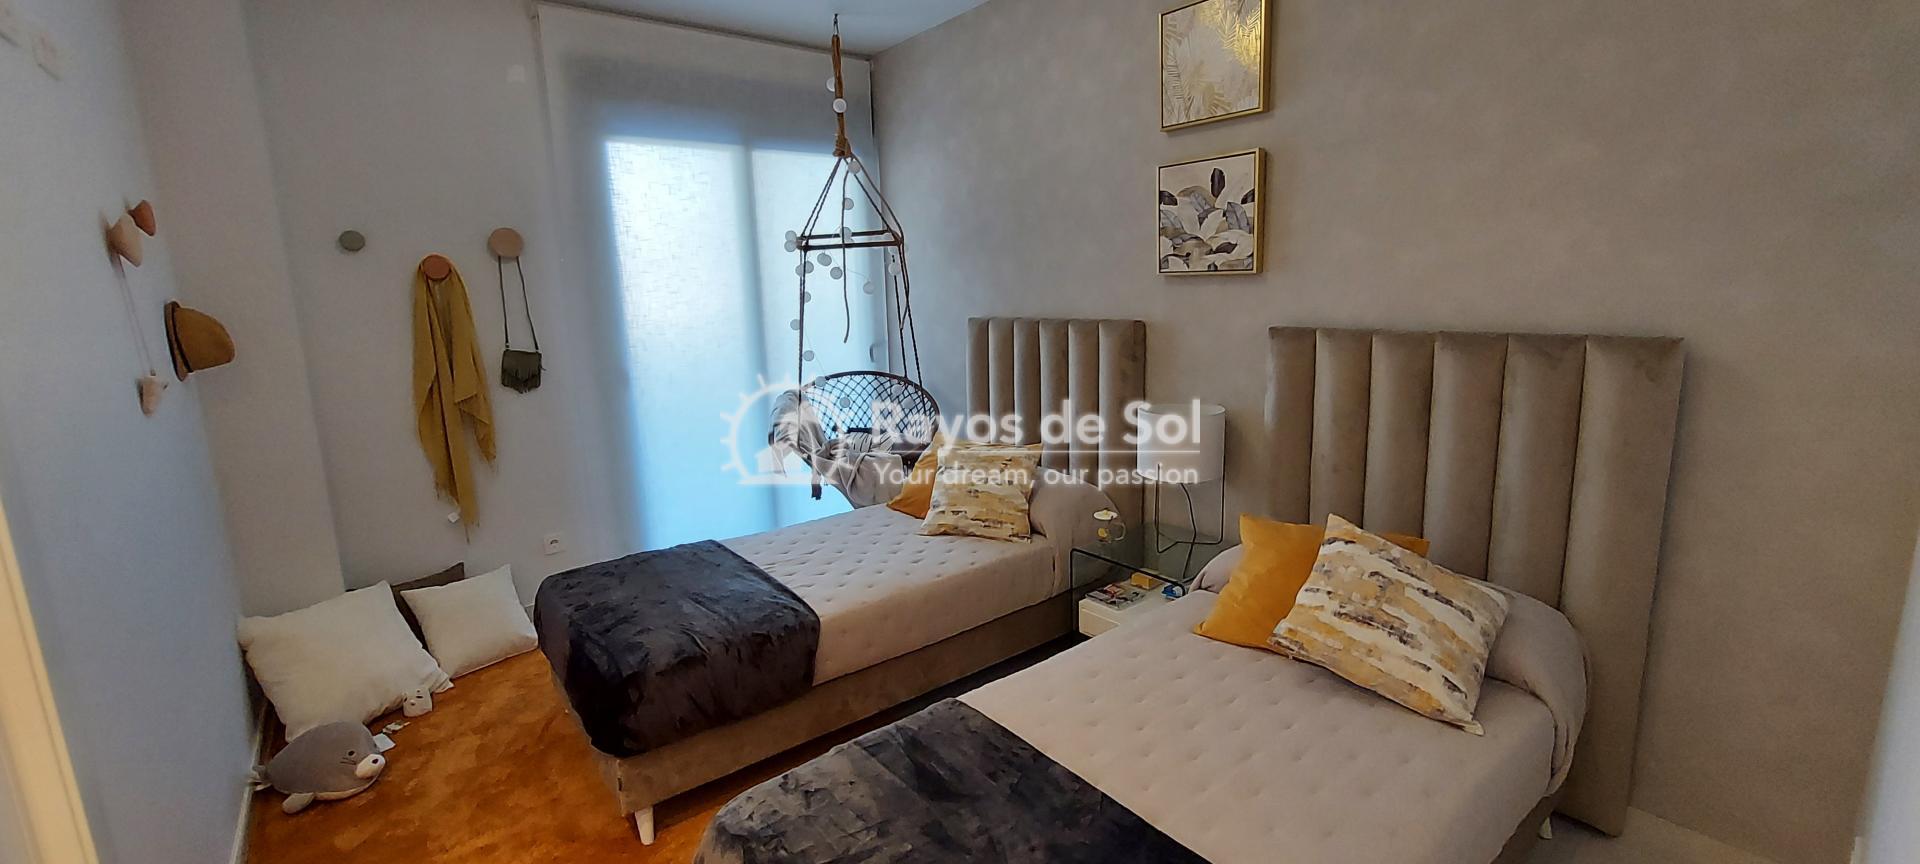 Apartment ground floor  in Orihuela Costa, Costa Blanca (amanecer6-gf-3d) - 10